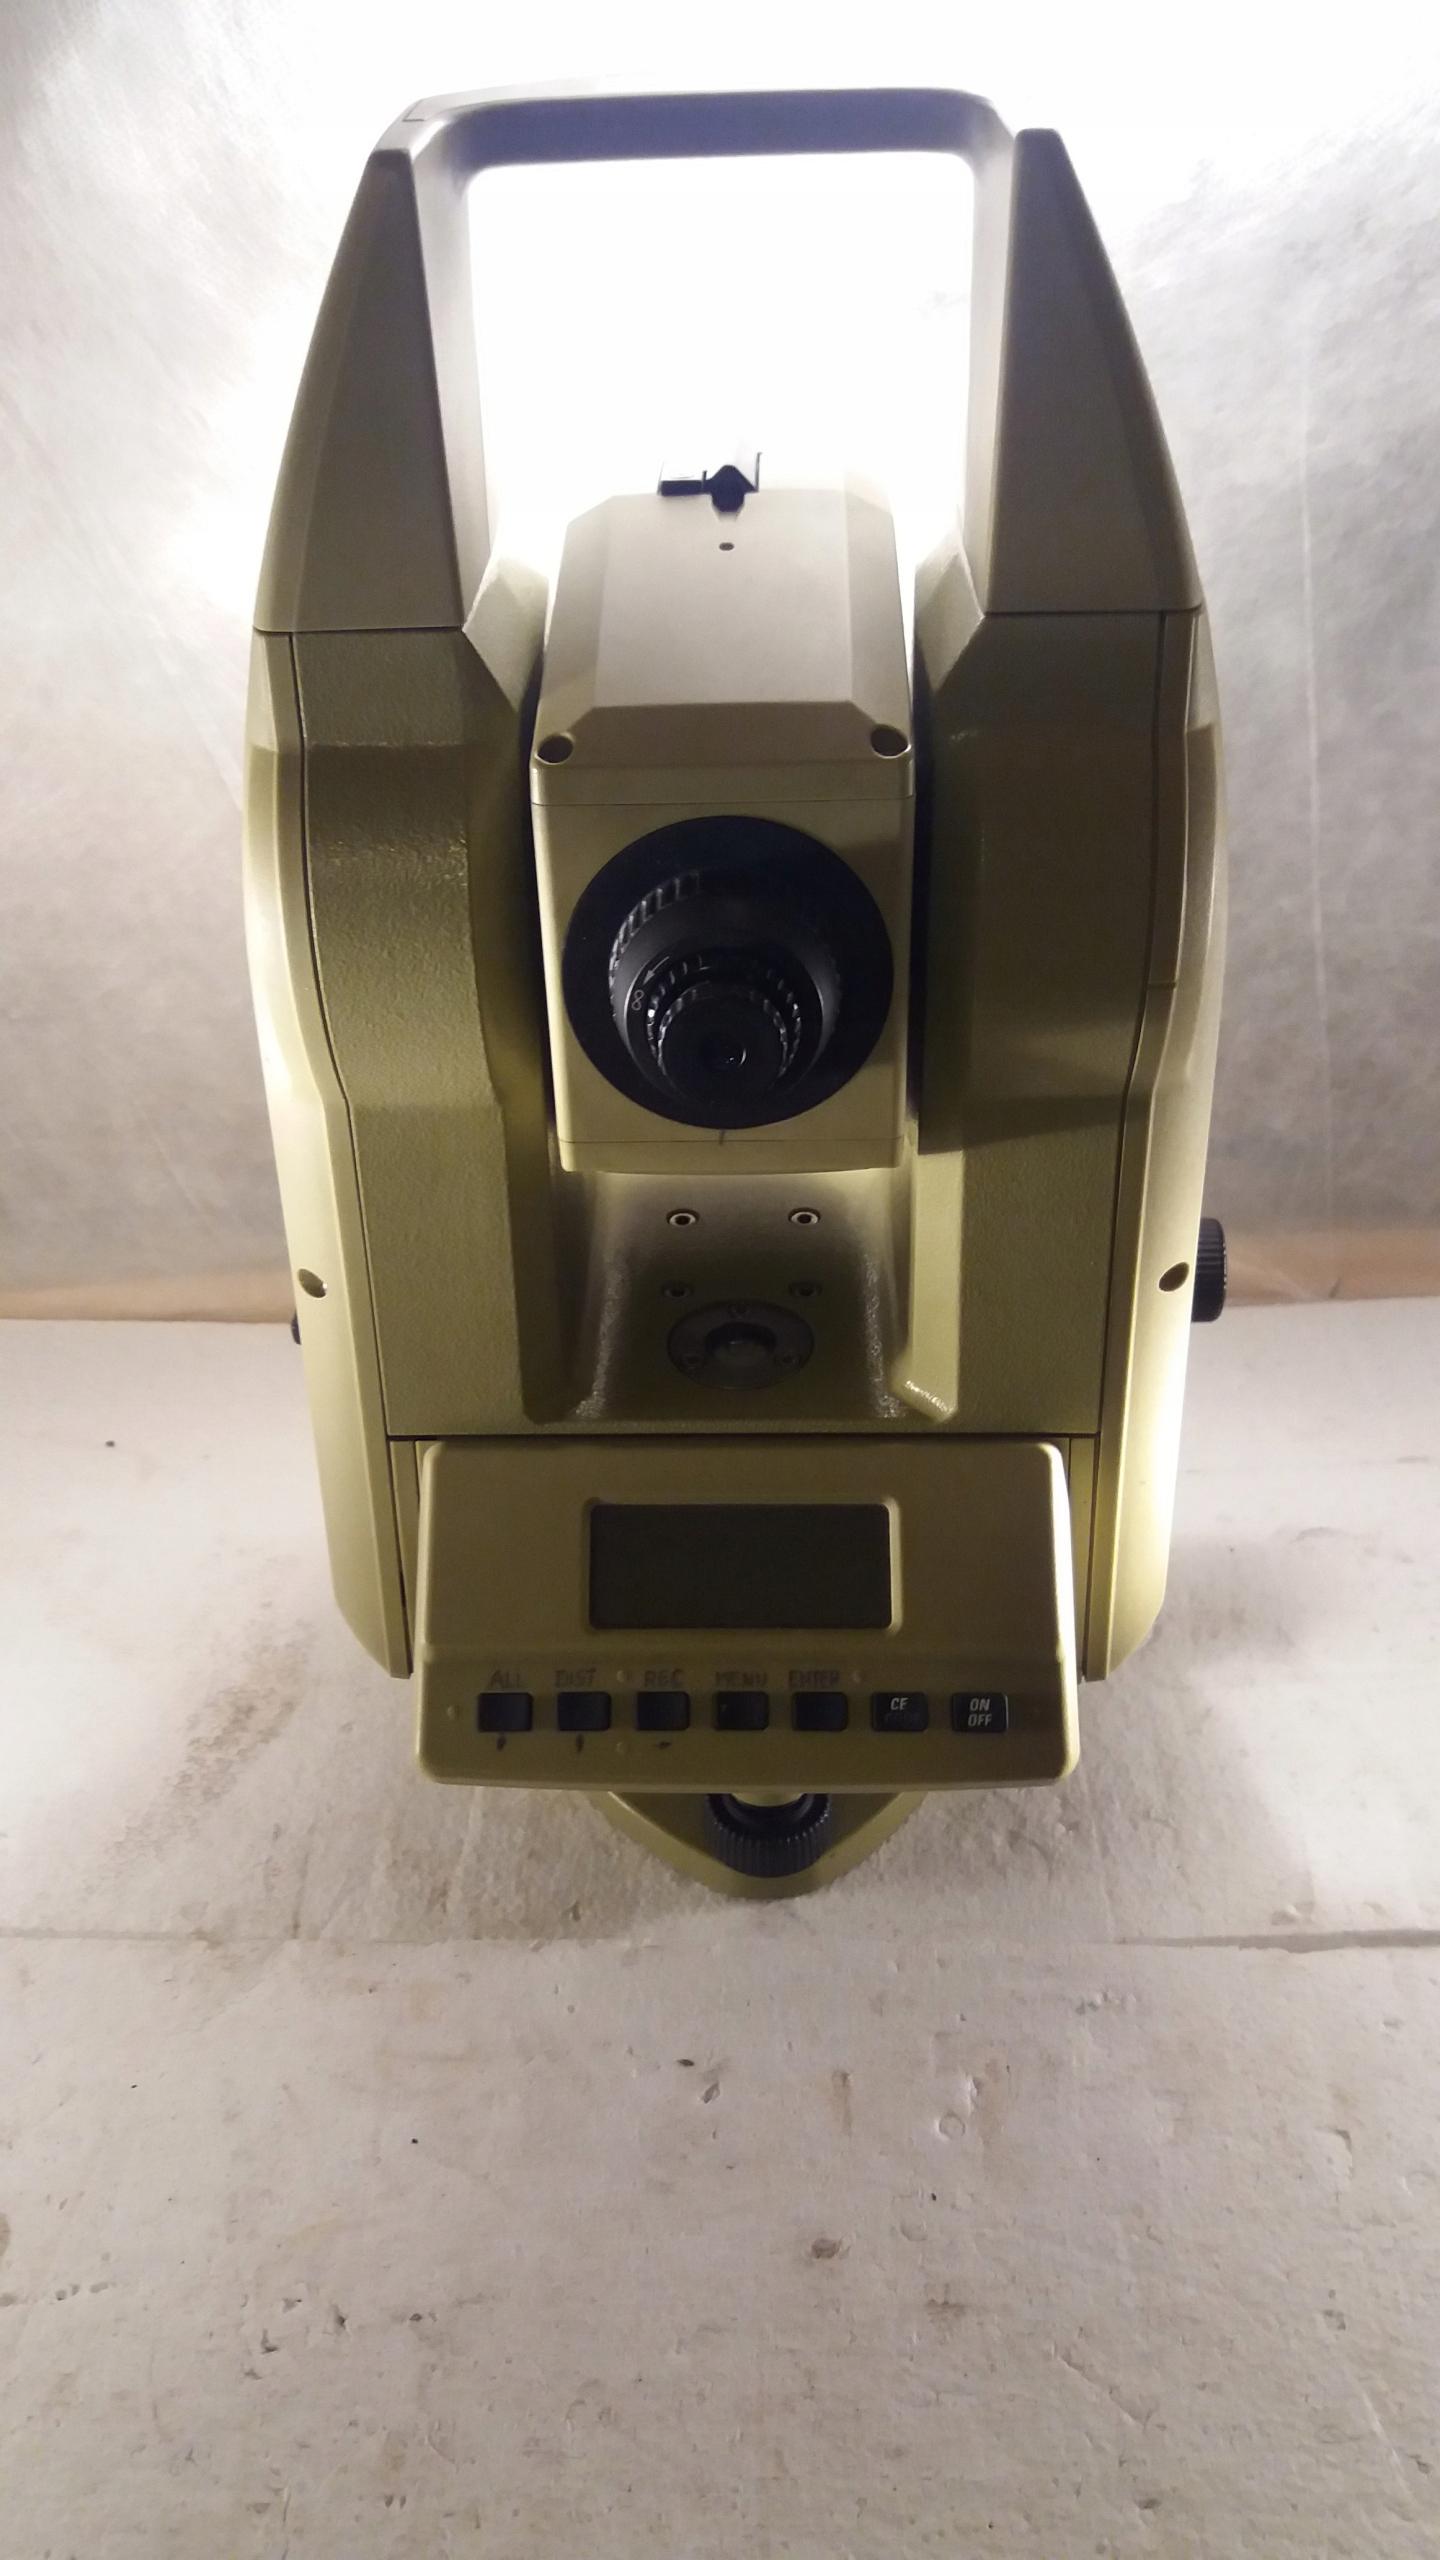 Tachimetr Leica TC600 + świadectwo